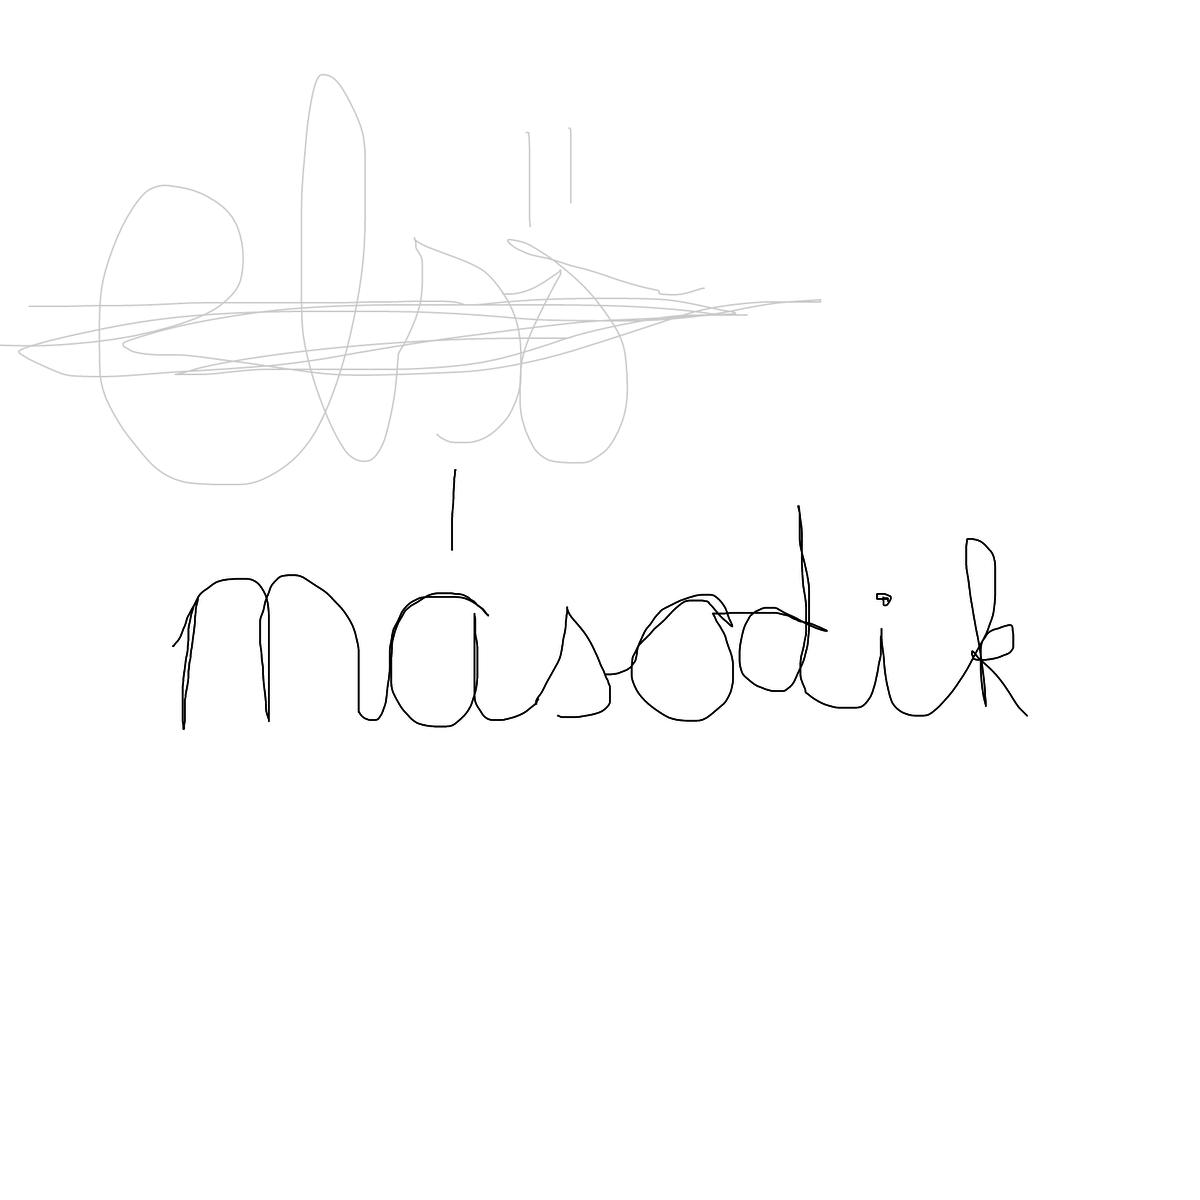 BAAAM drawing#7900 lat:47.4983749389648440lng: 19.0405216217041000